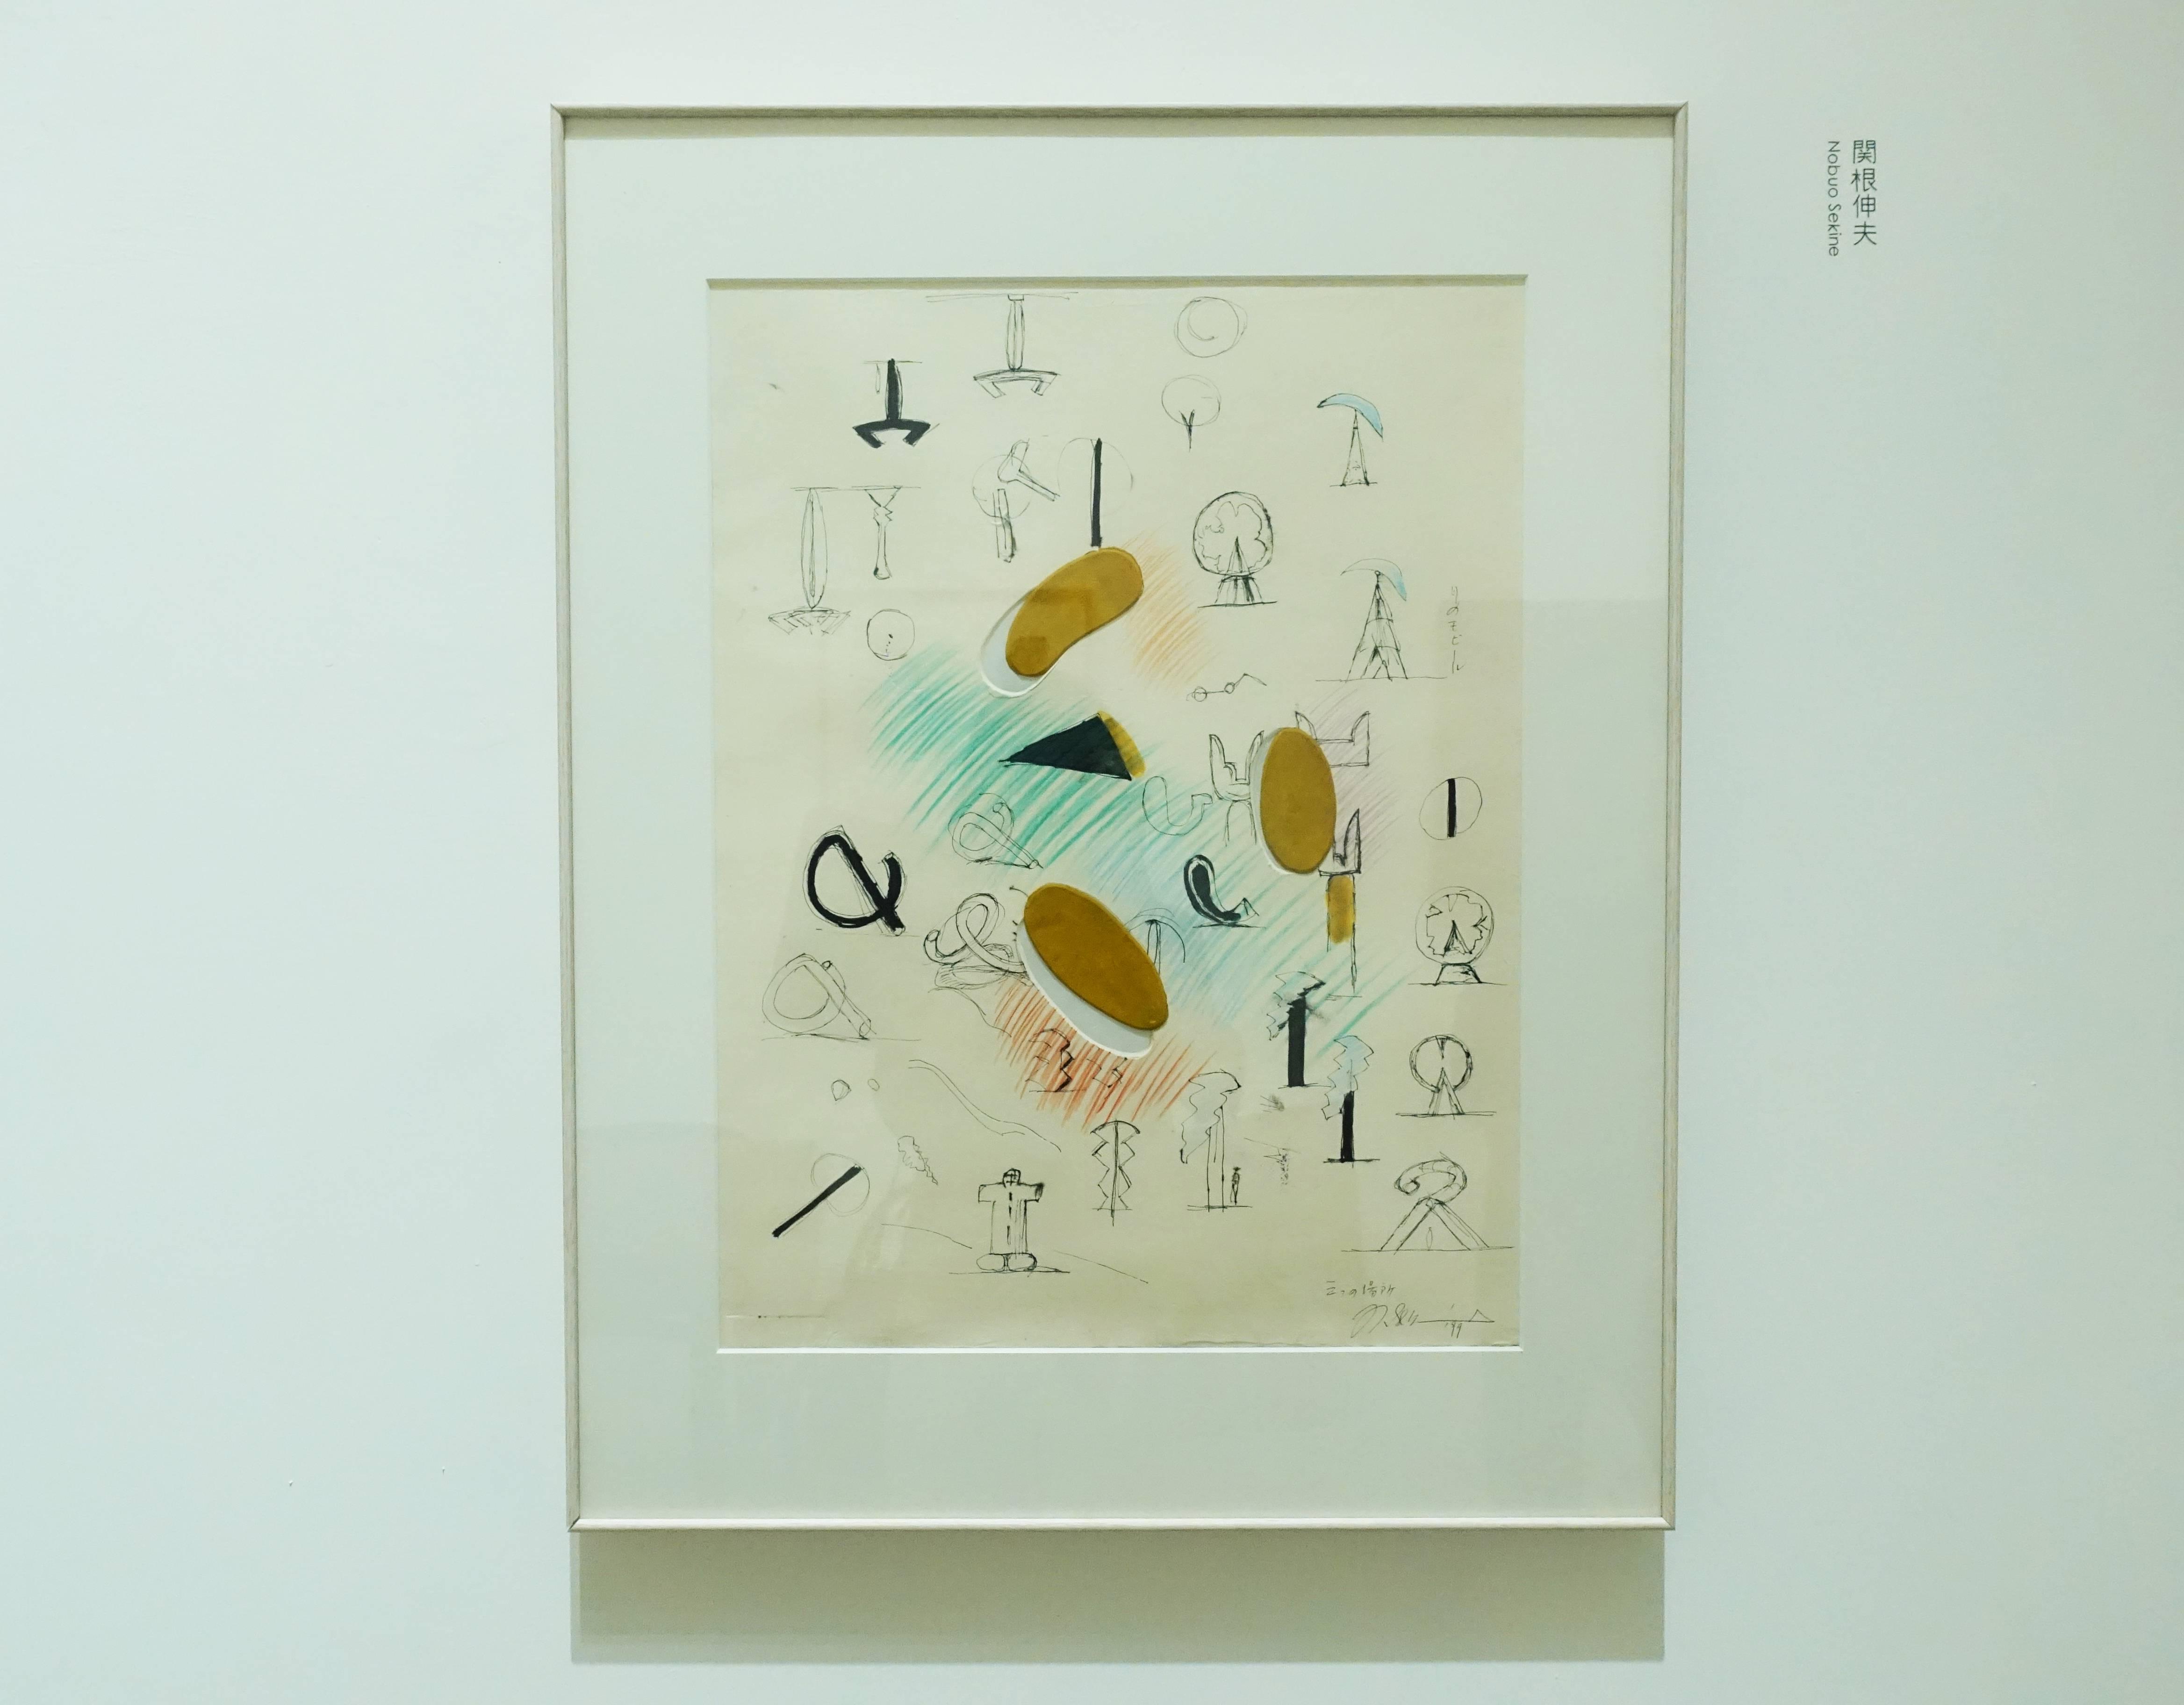 関根伸夫,《Three locations》,54 x 42 cm,Mixed media、paper,1999。